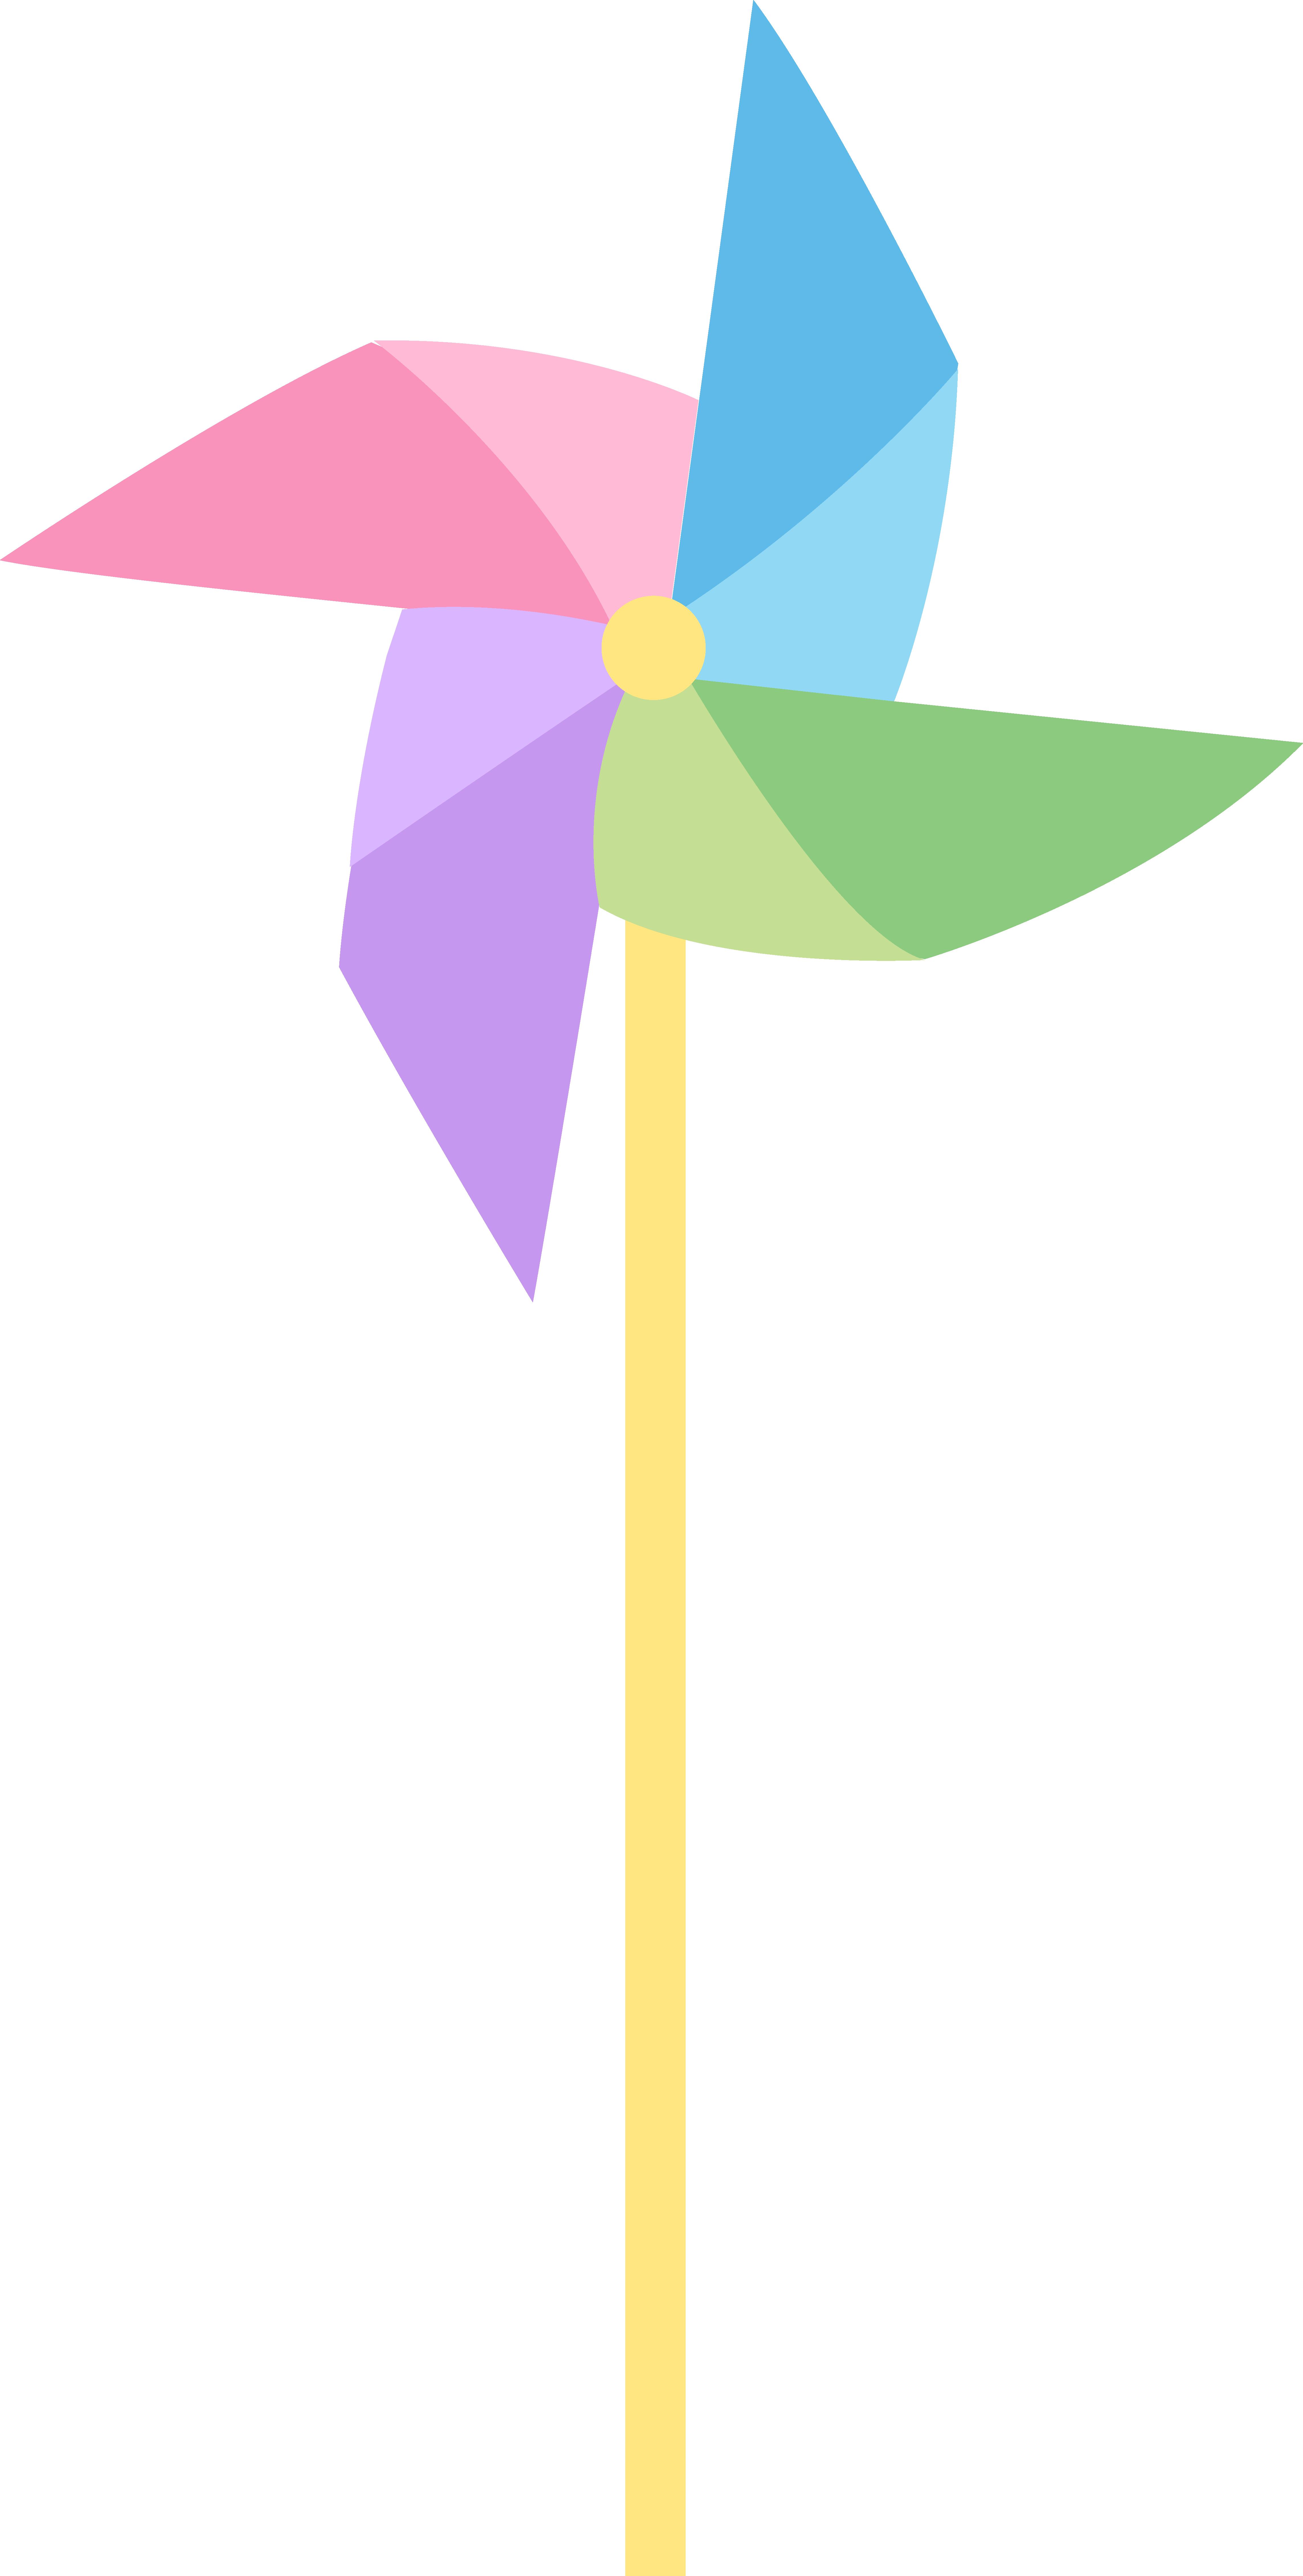 Free Pinwheel Cliparts, Download Free Clip Art, Free Clip.